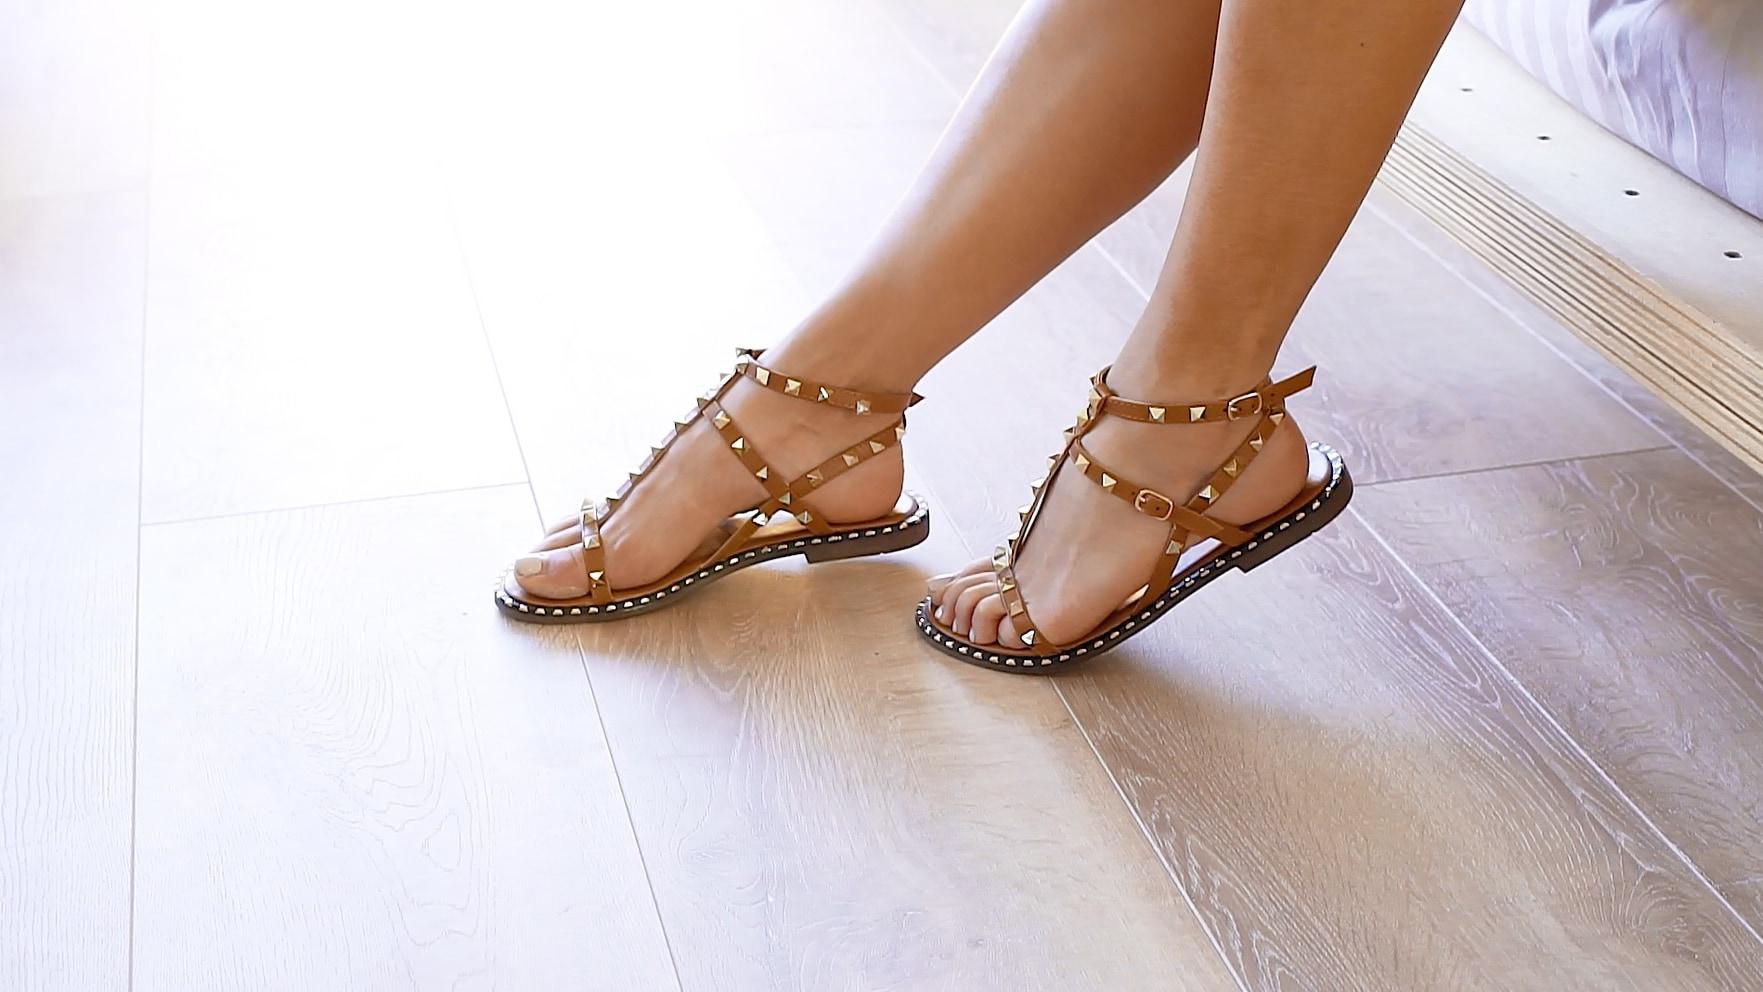 MIGATO Summer holiday wardrobe - Romper and sandals